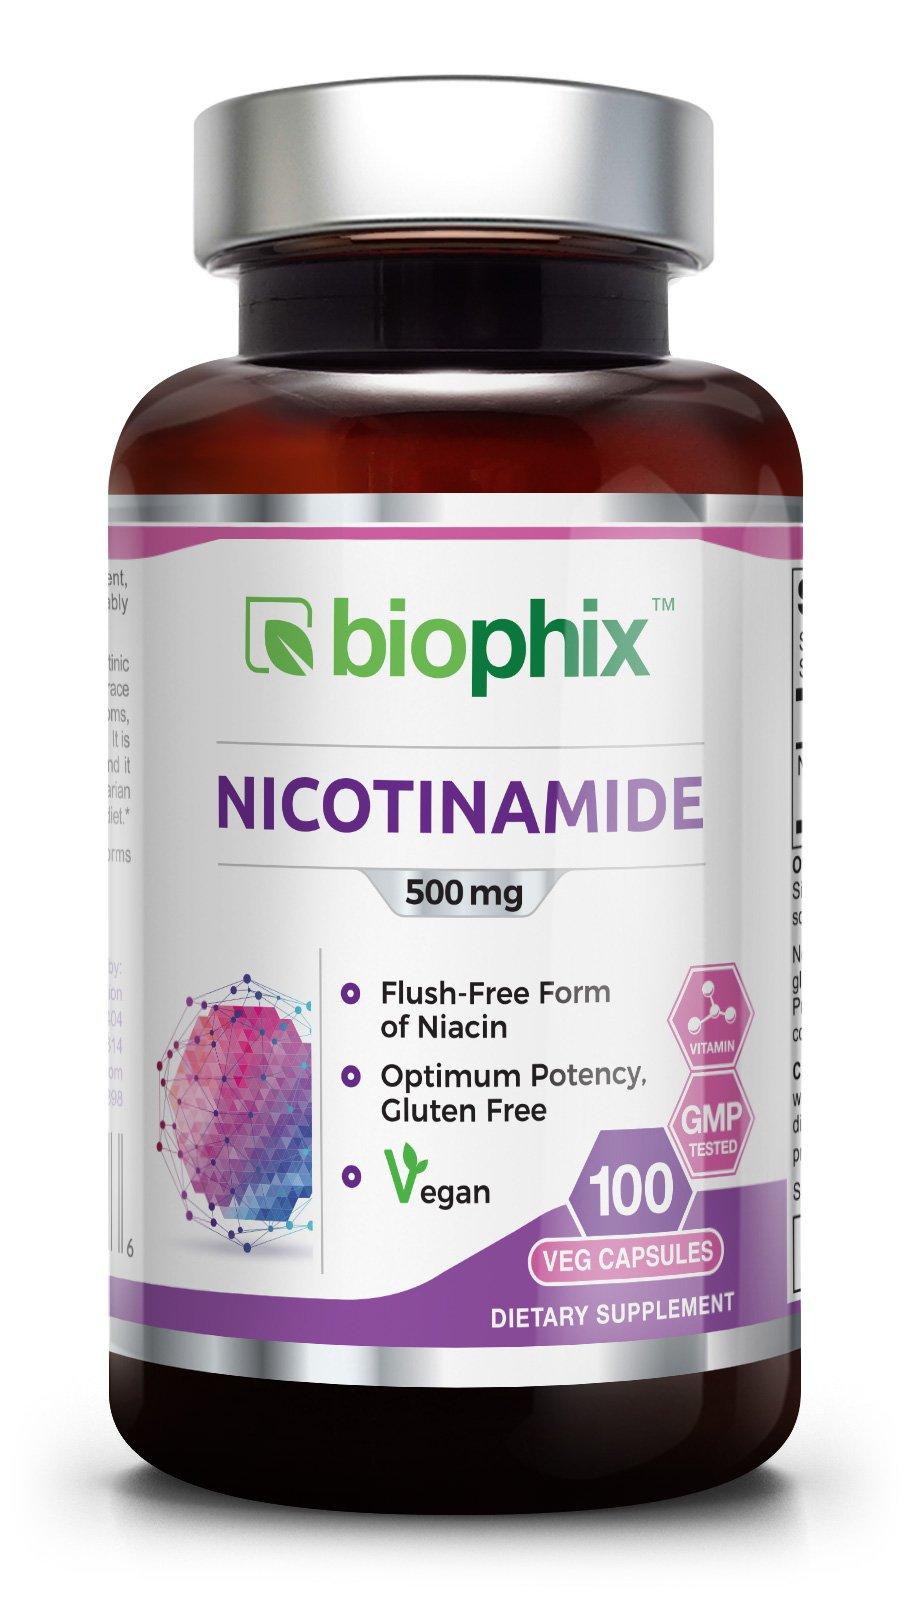 B-3 Nicotinamide 500 mg 100 Vegetarian Capsules Flush Free - Natural Flush-Free Vitamin Formula | Gluten-Free Nicotinic Amide Niacin | Supports Skin Health | Healthy Cell Repair